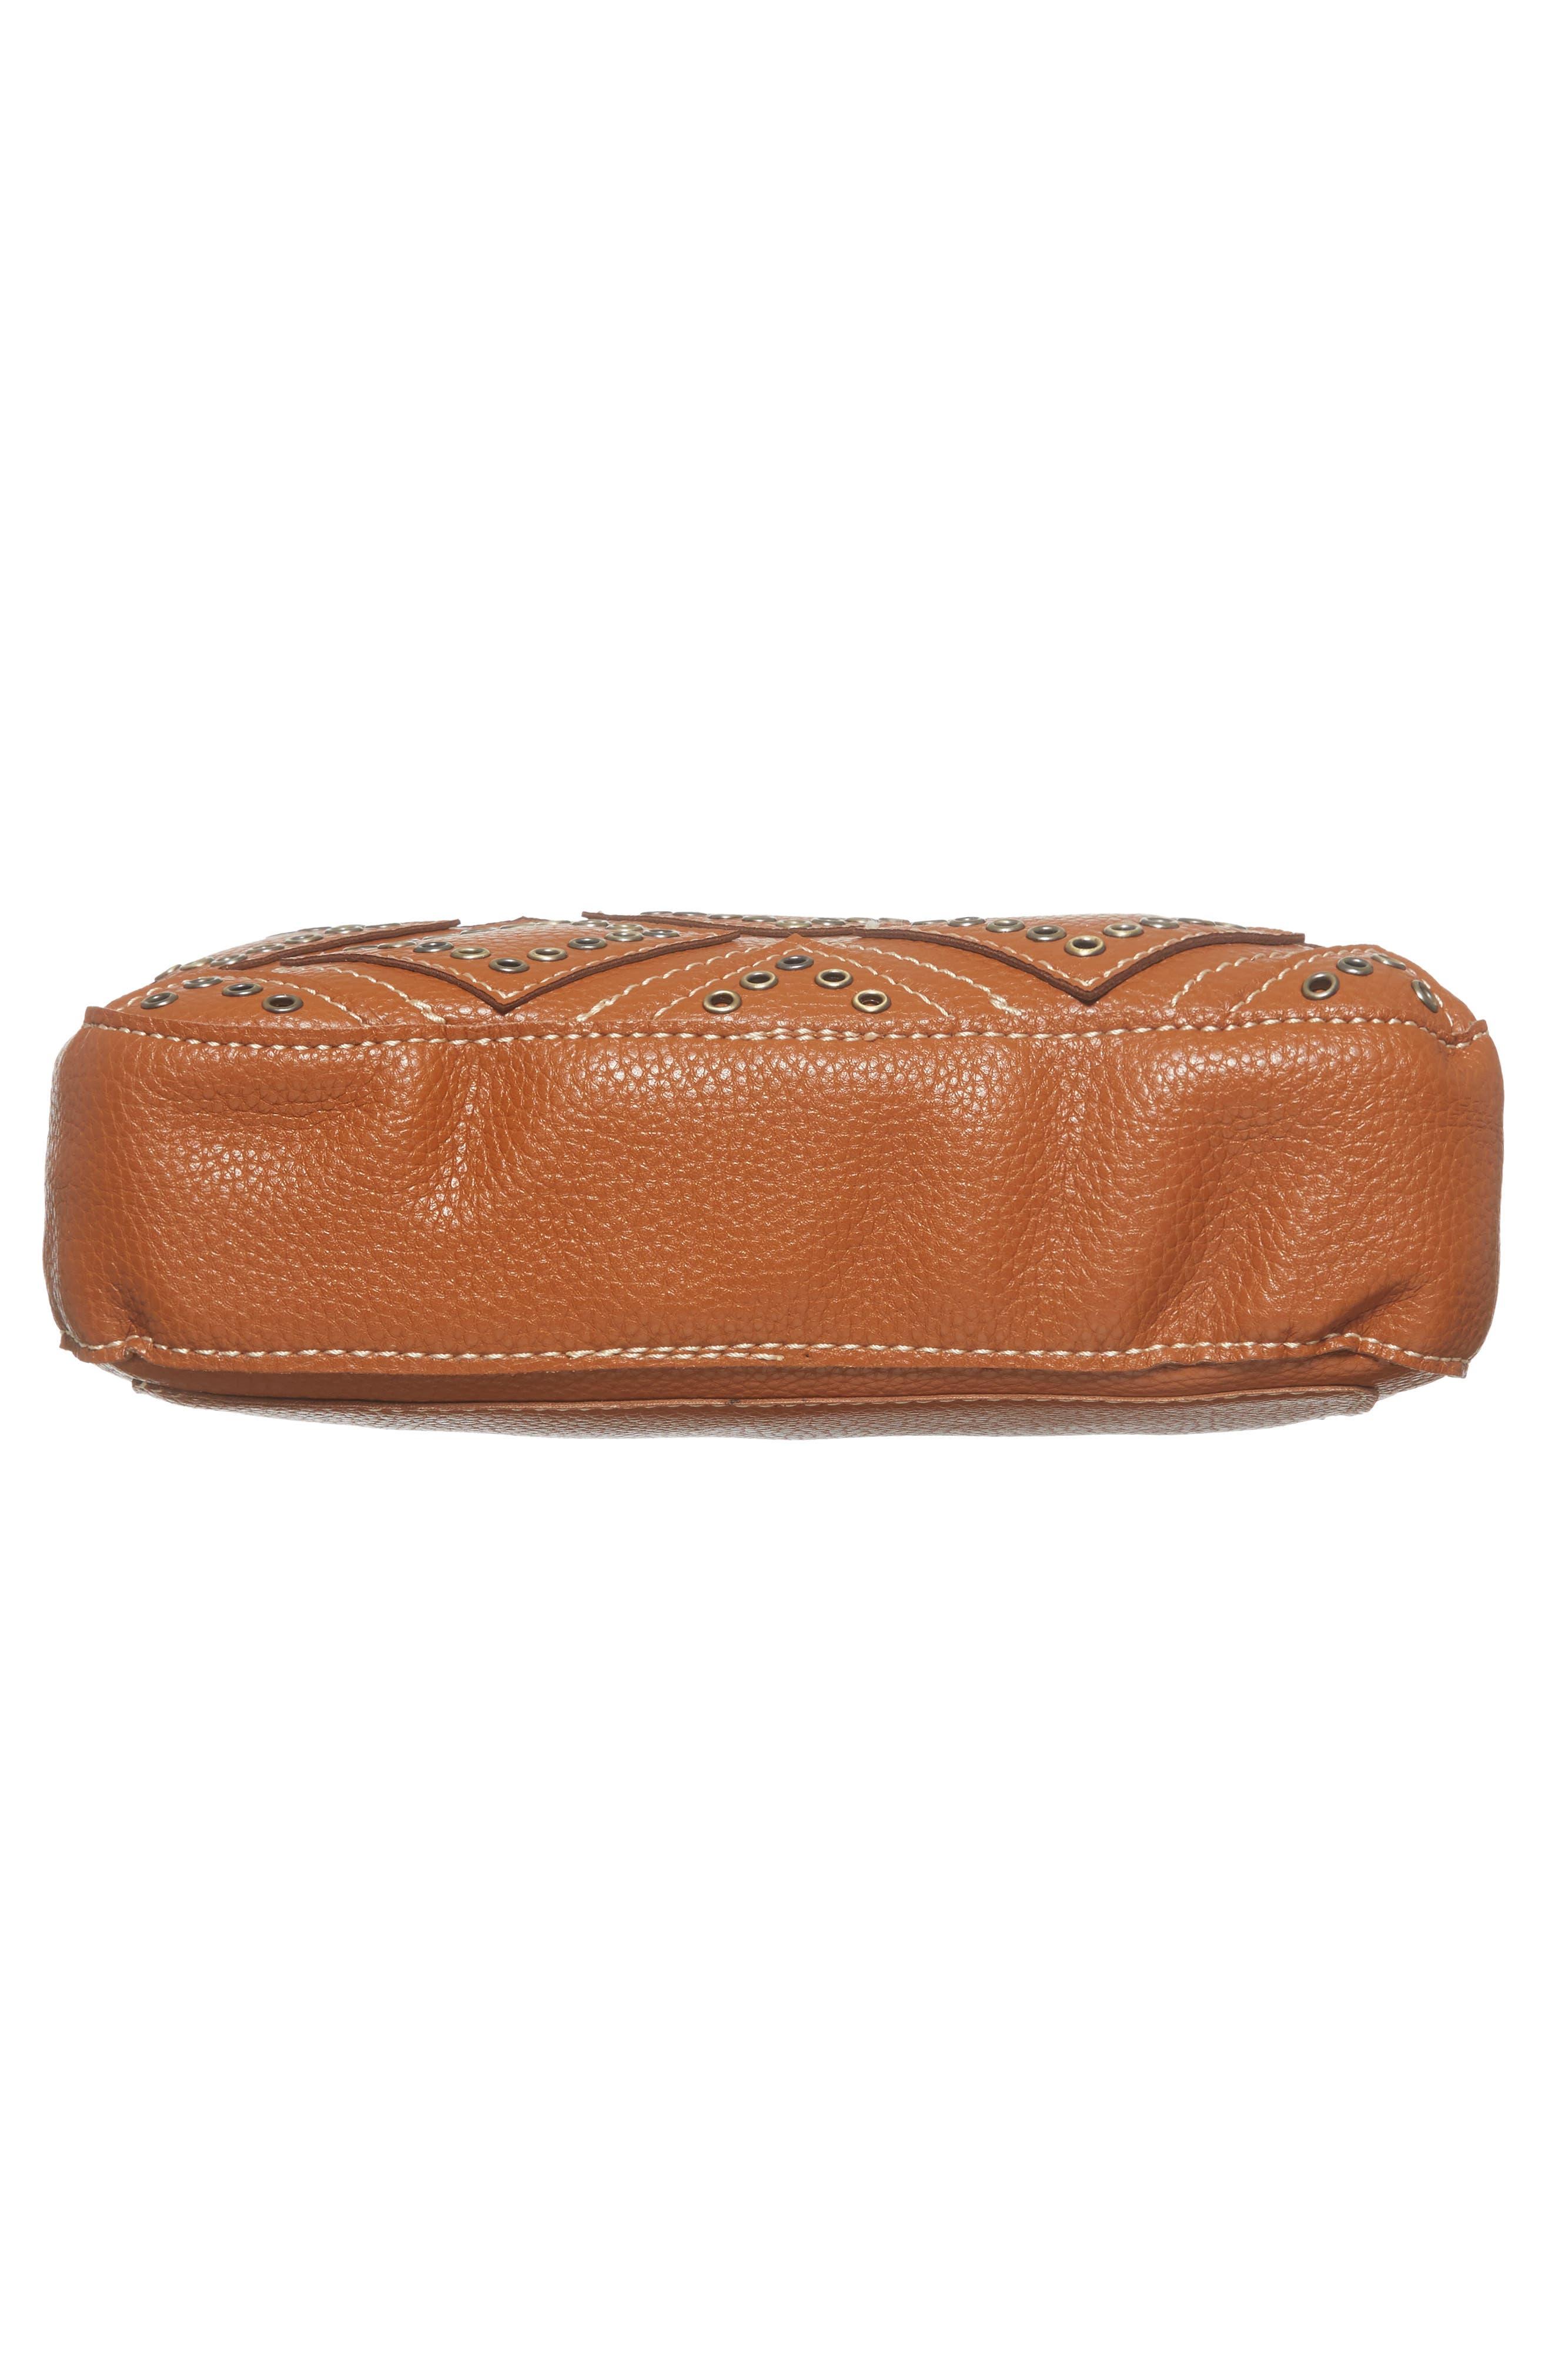 Skylar Faux Leather Crossbody Bag,                             Alternate thumbnail 5, color,                             Saddle